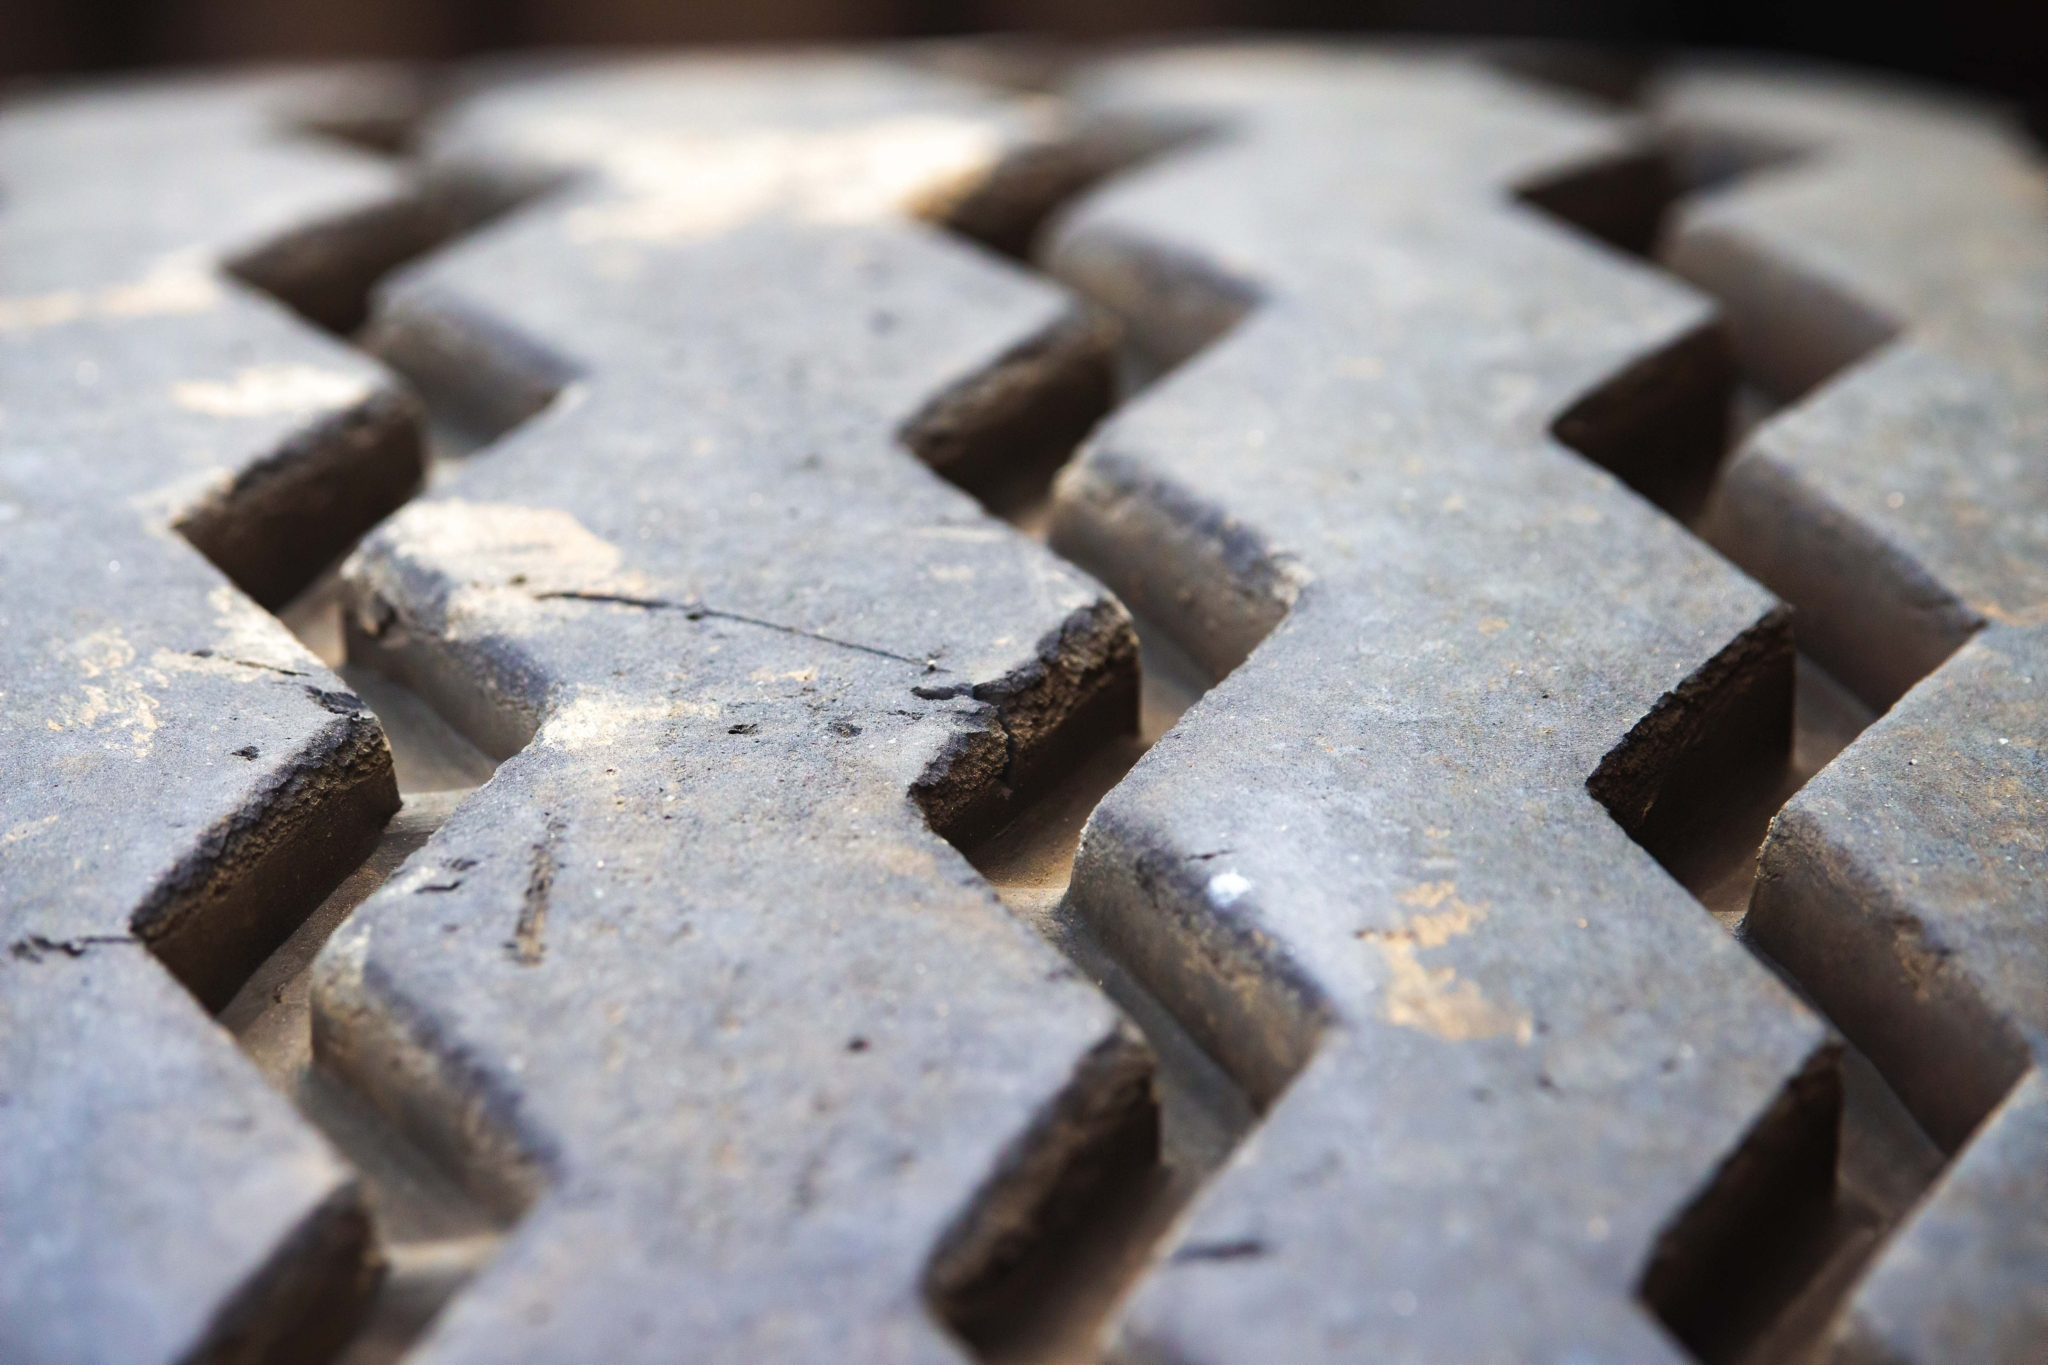 RRG raising the profile of major repair and retreading businesses